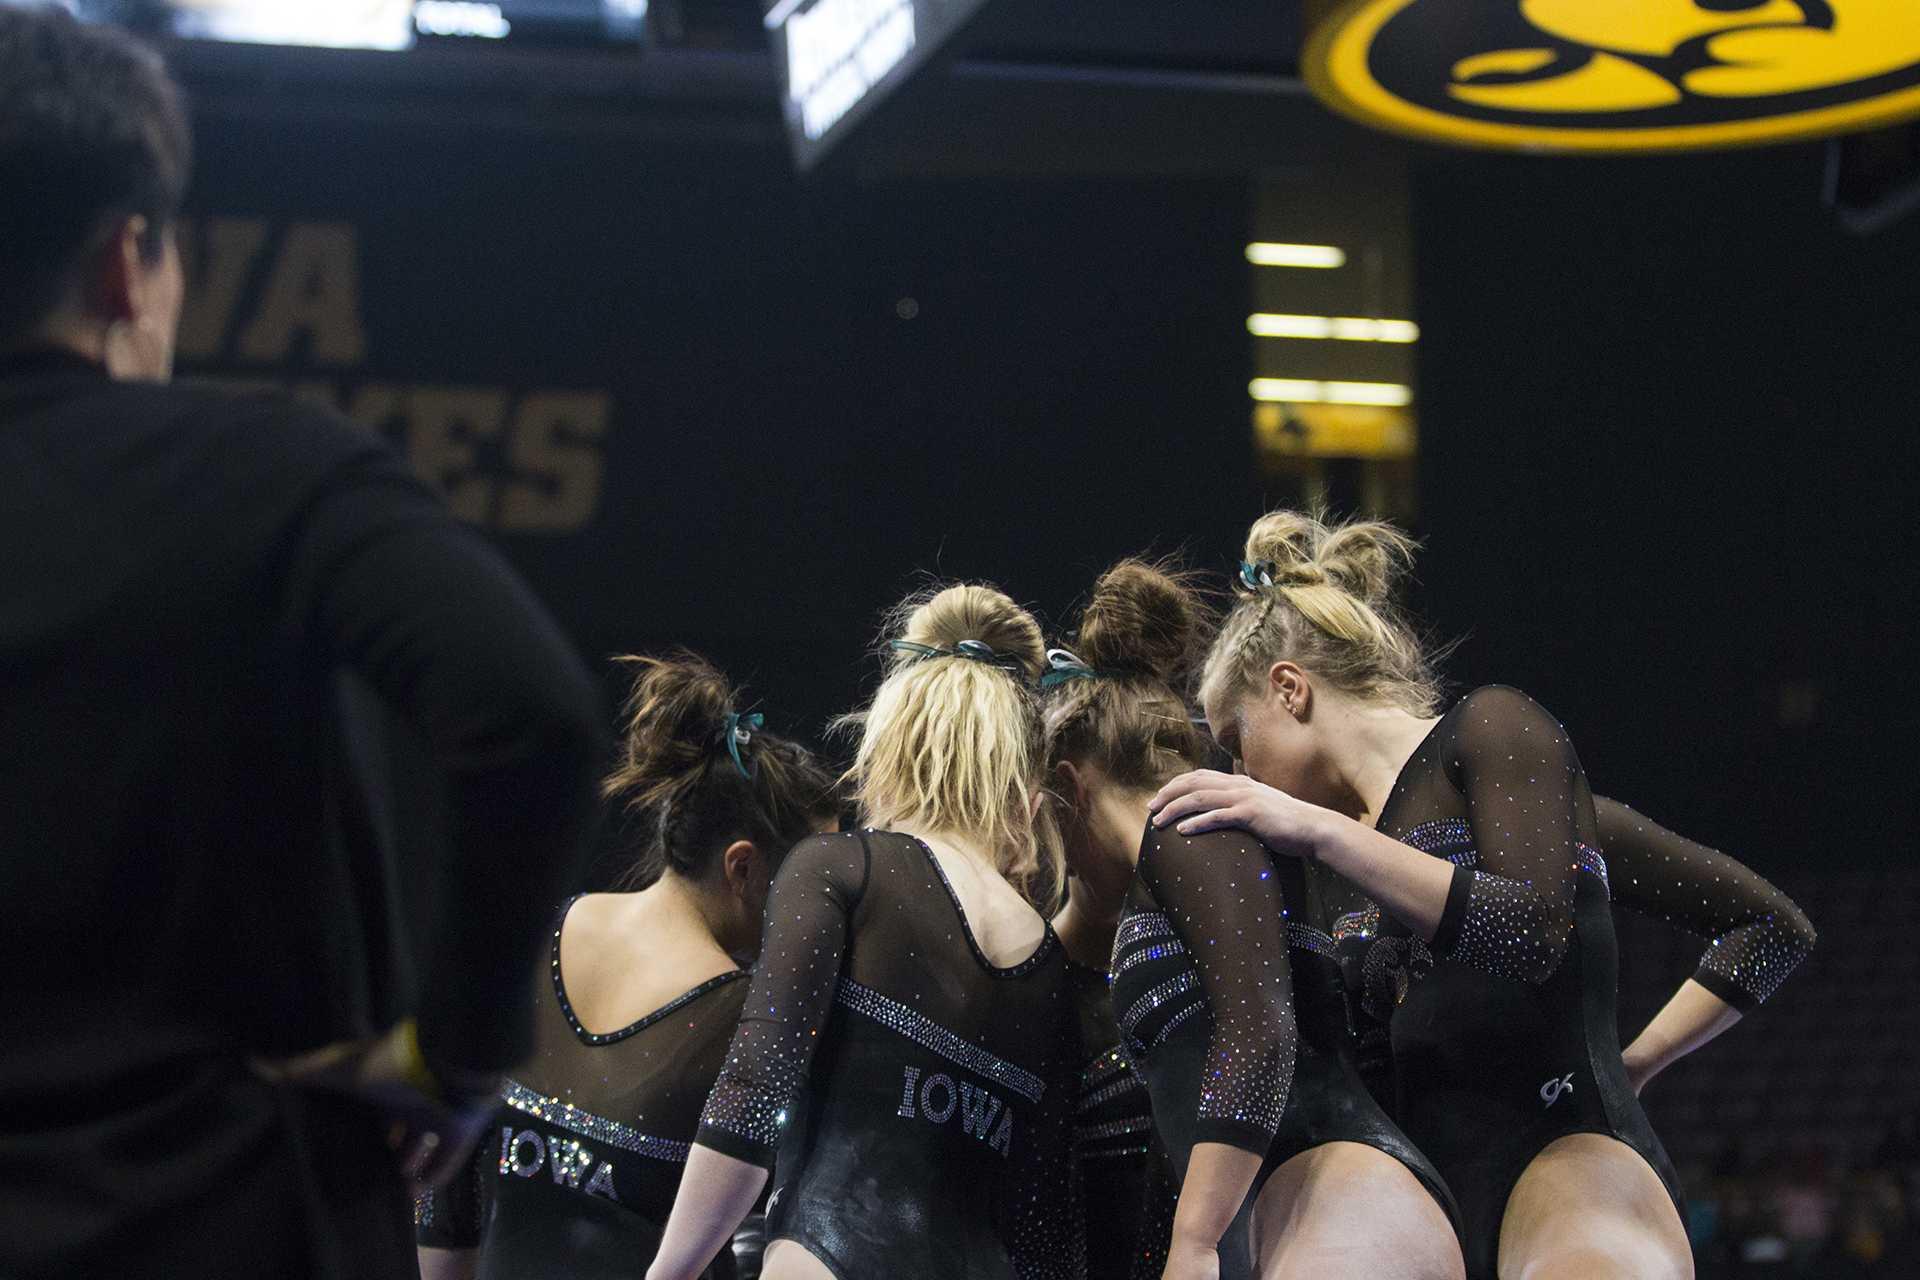 Photos: Iowa women's gymnastics vs SEMO